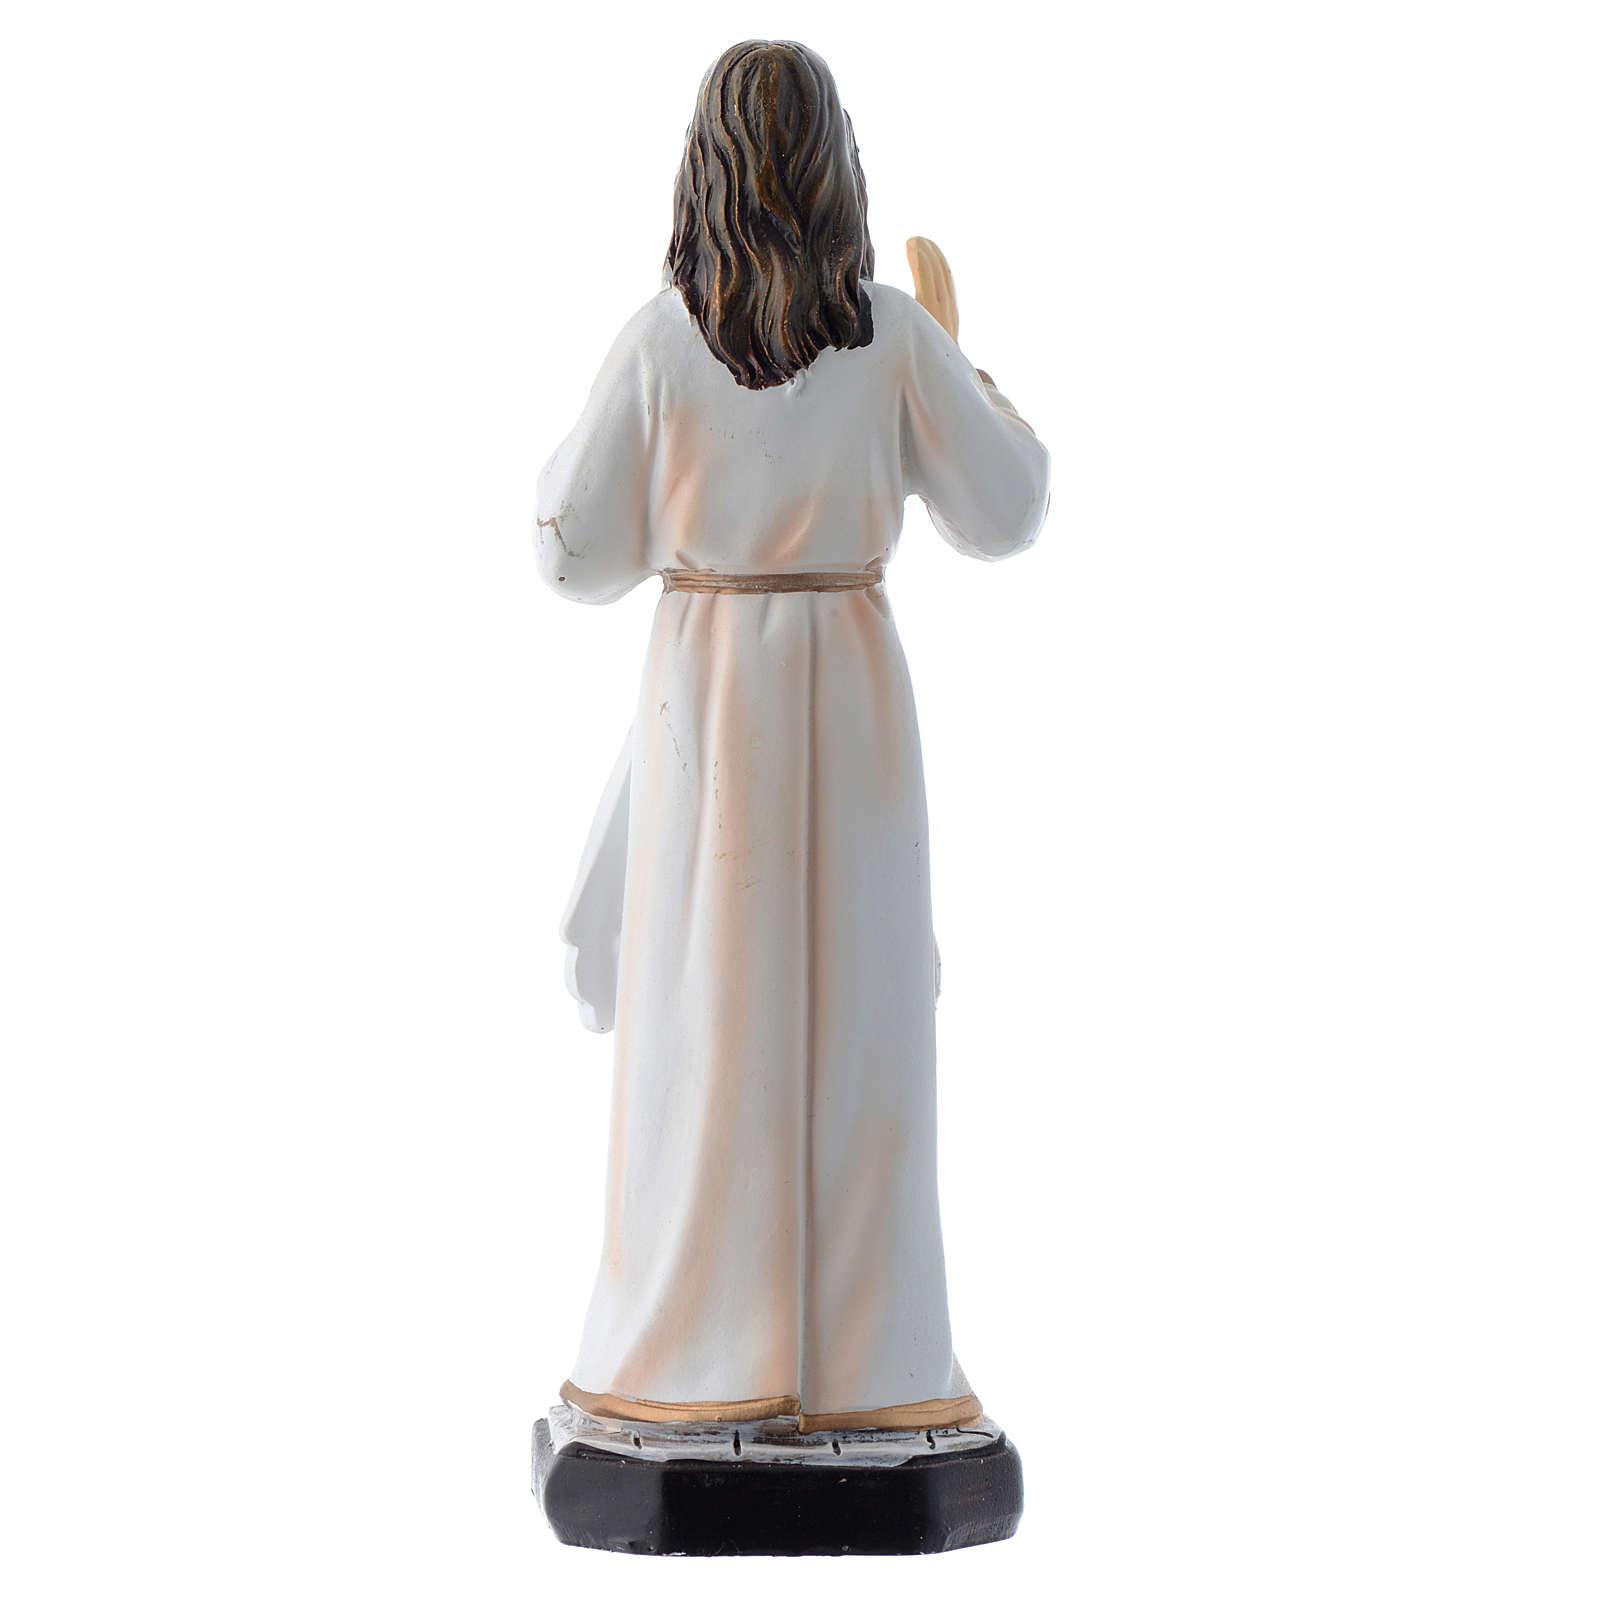 Jesús misericordioso 12 cm pvc caja ORACIÓN MULTILINGÜE 4